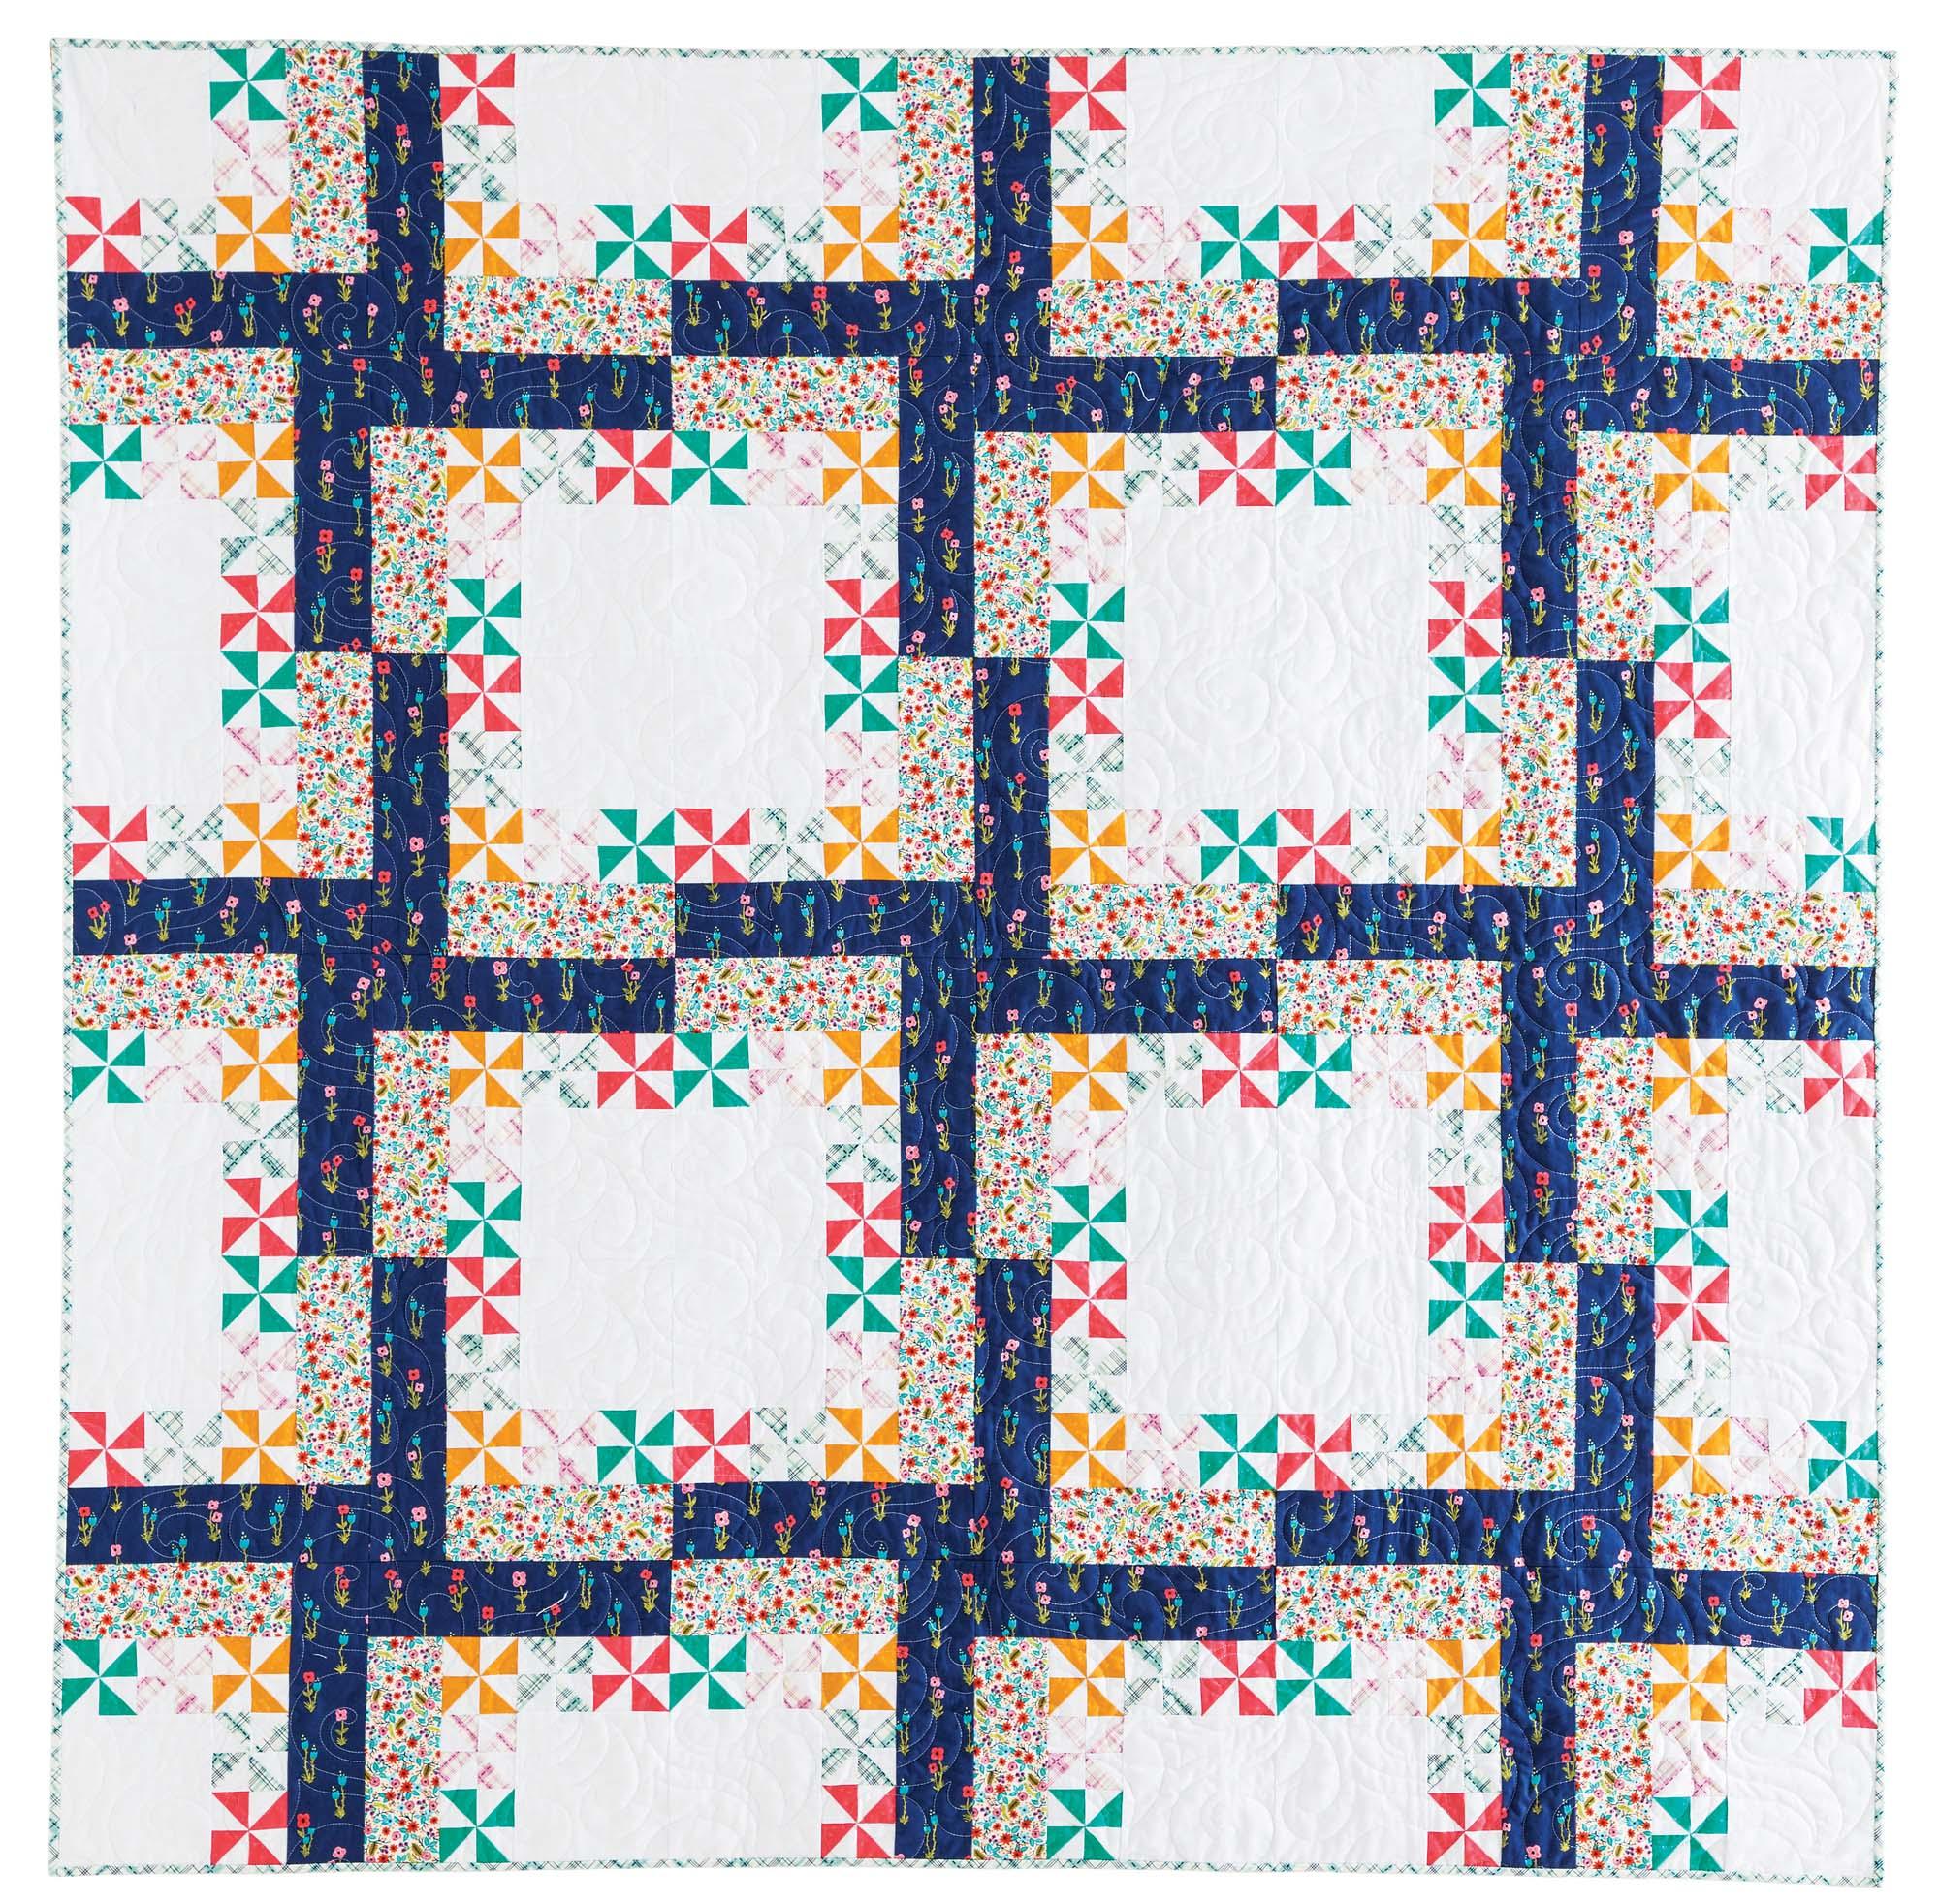 quilt-pinwheel-row-flat